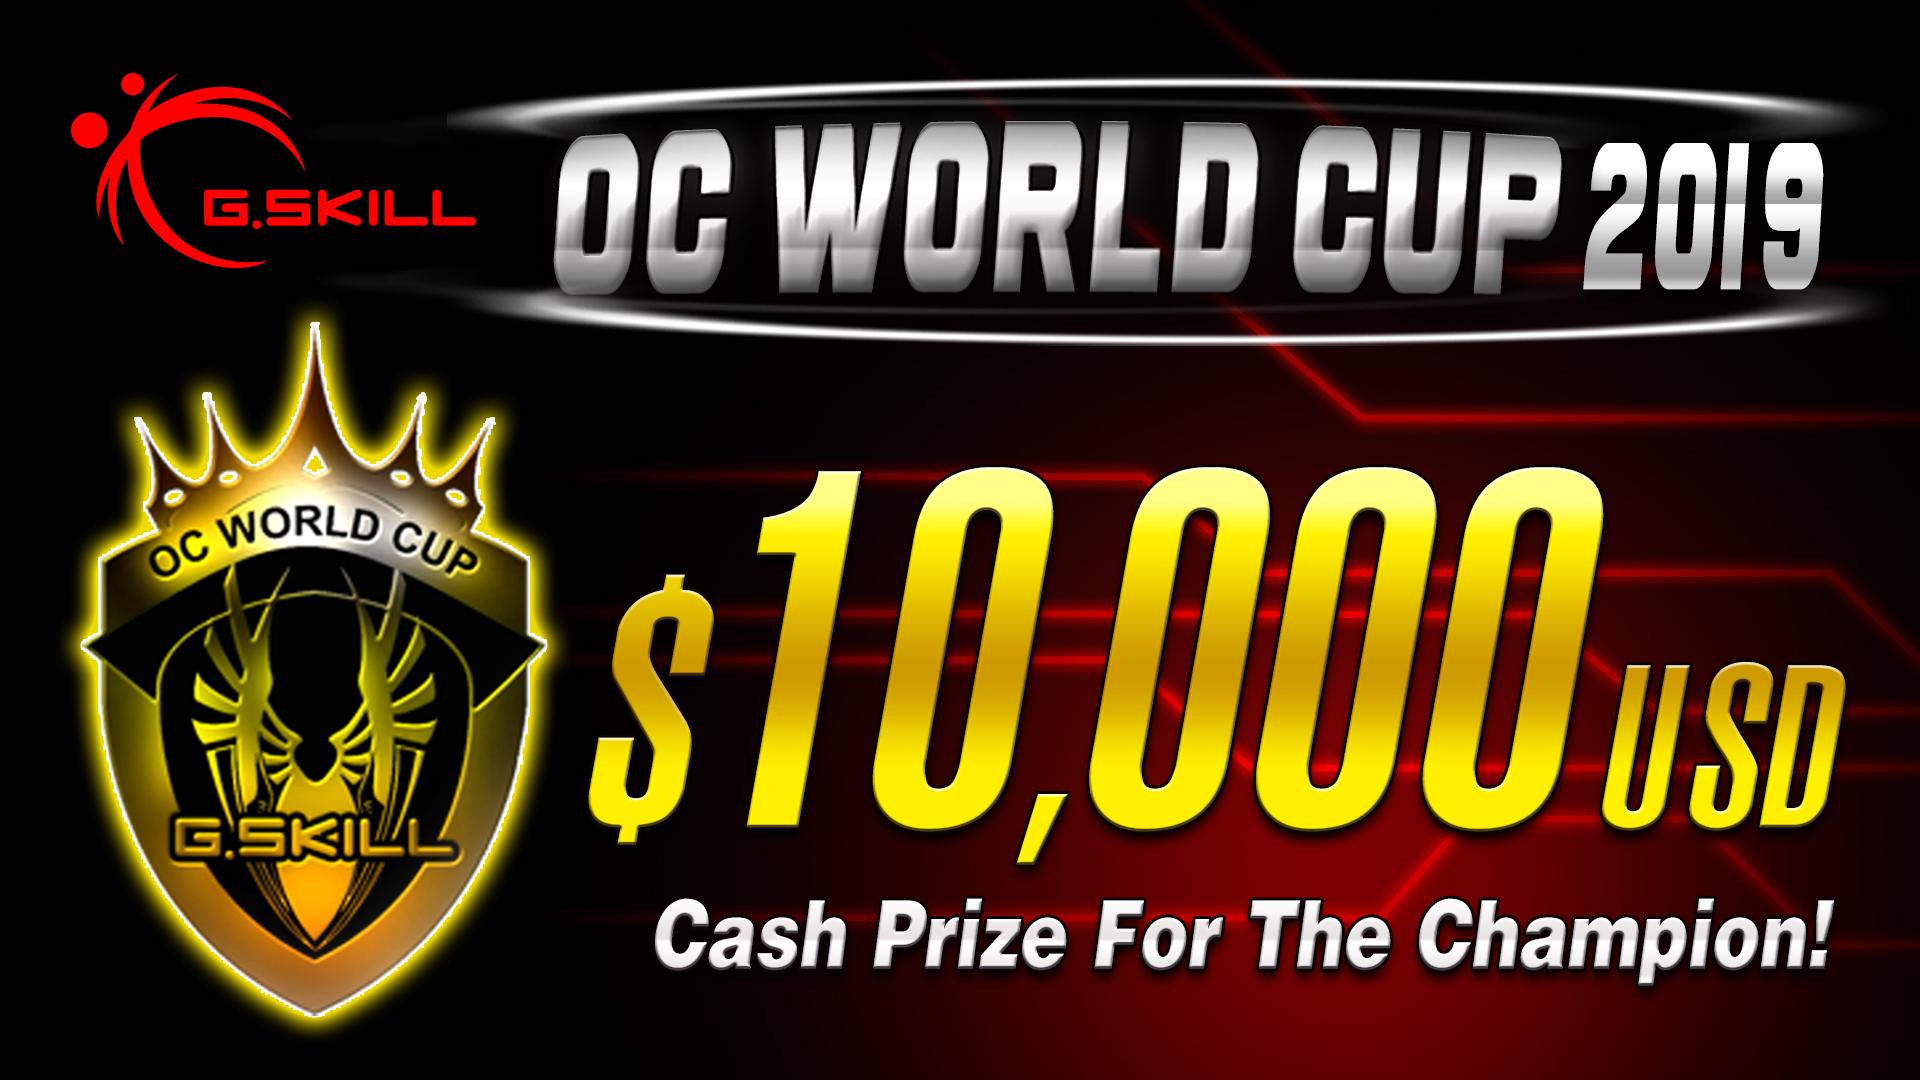 OCworldCUP2019_1920x1080_2.jpg